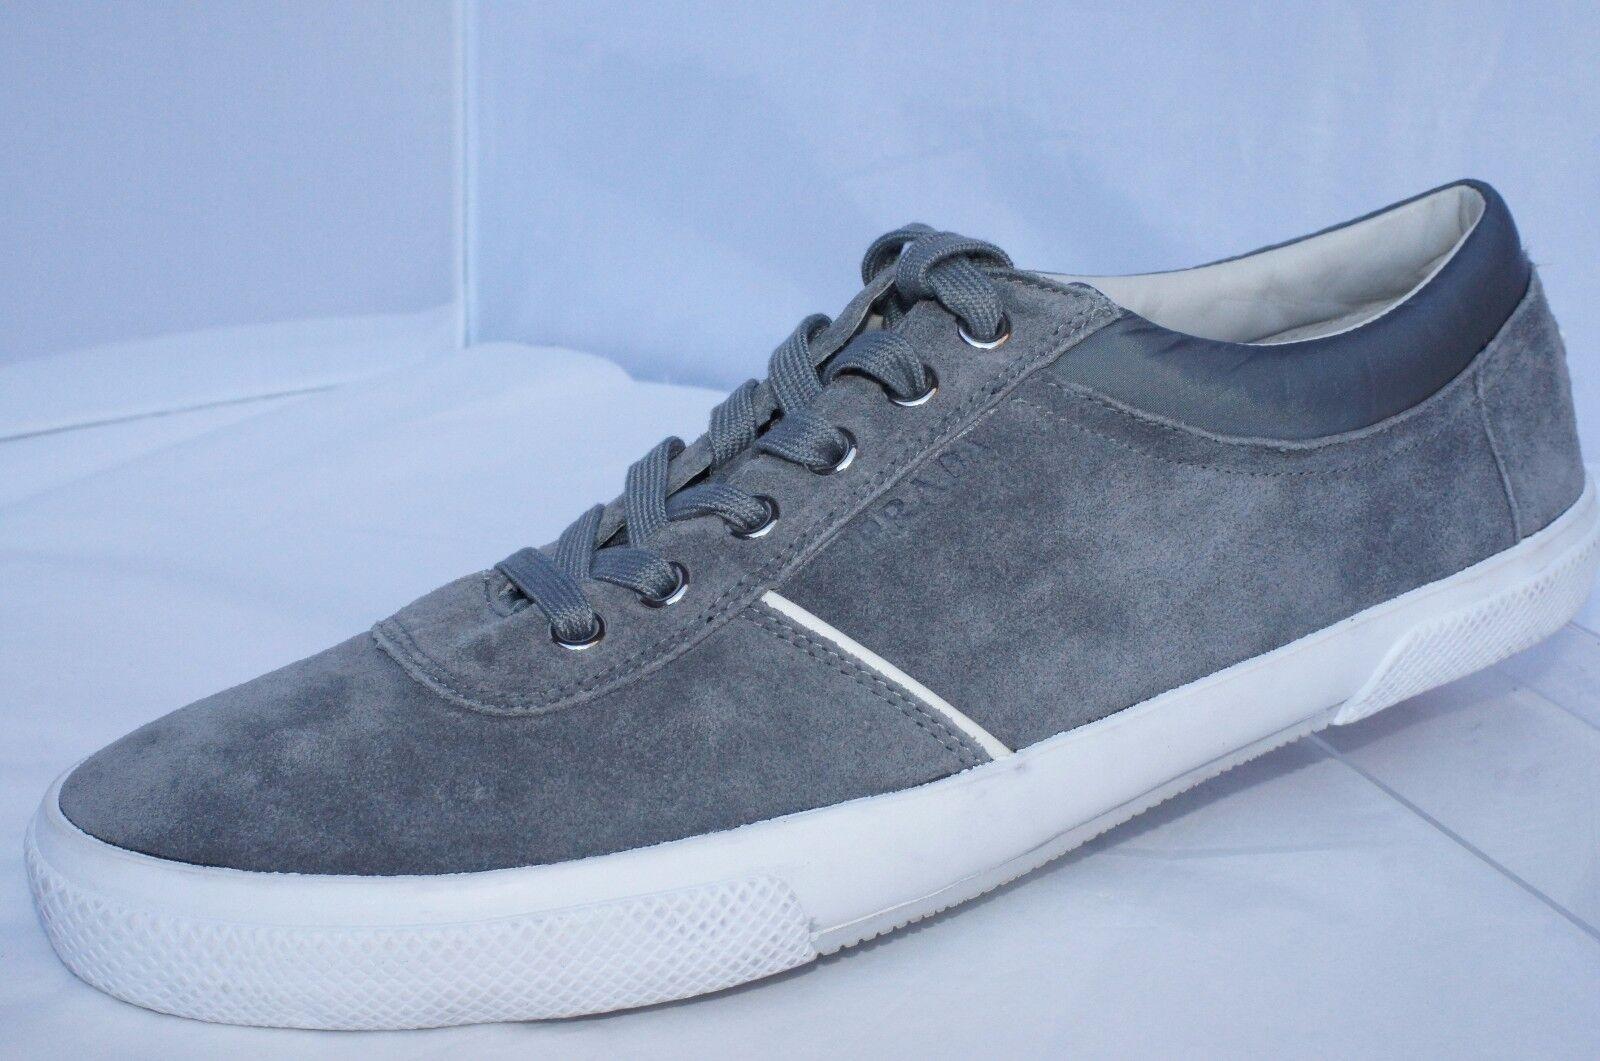 93418b60 PRADA Men's Shoes Tennis Size 10 Scamosciato 6 Gray SNEAKERS Suede